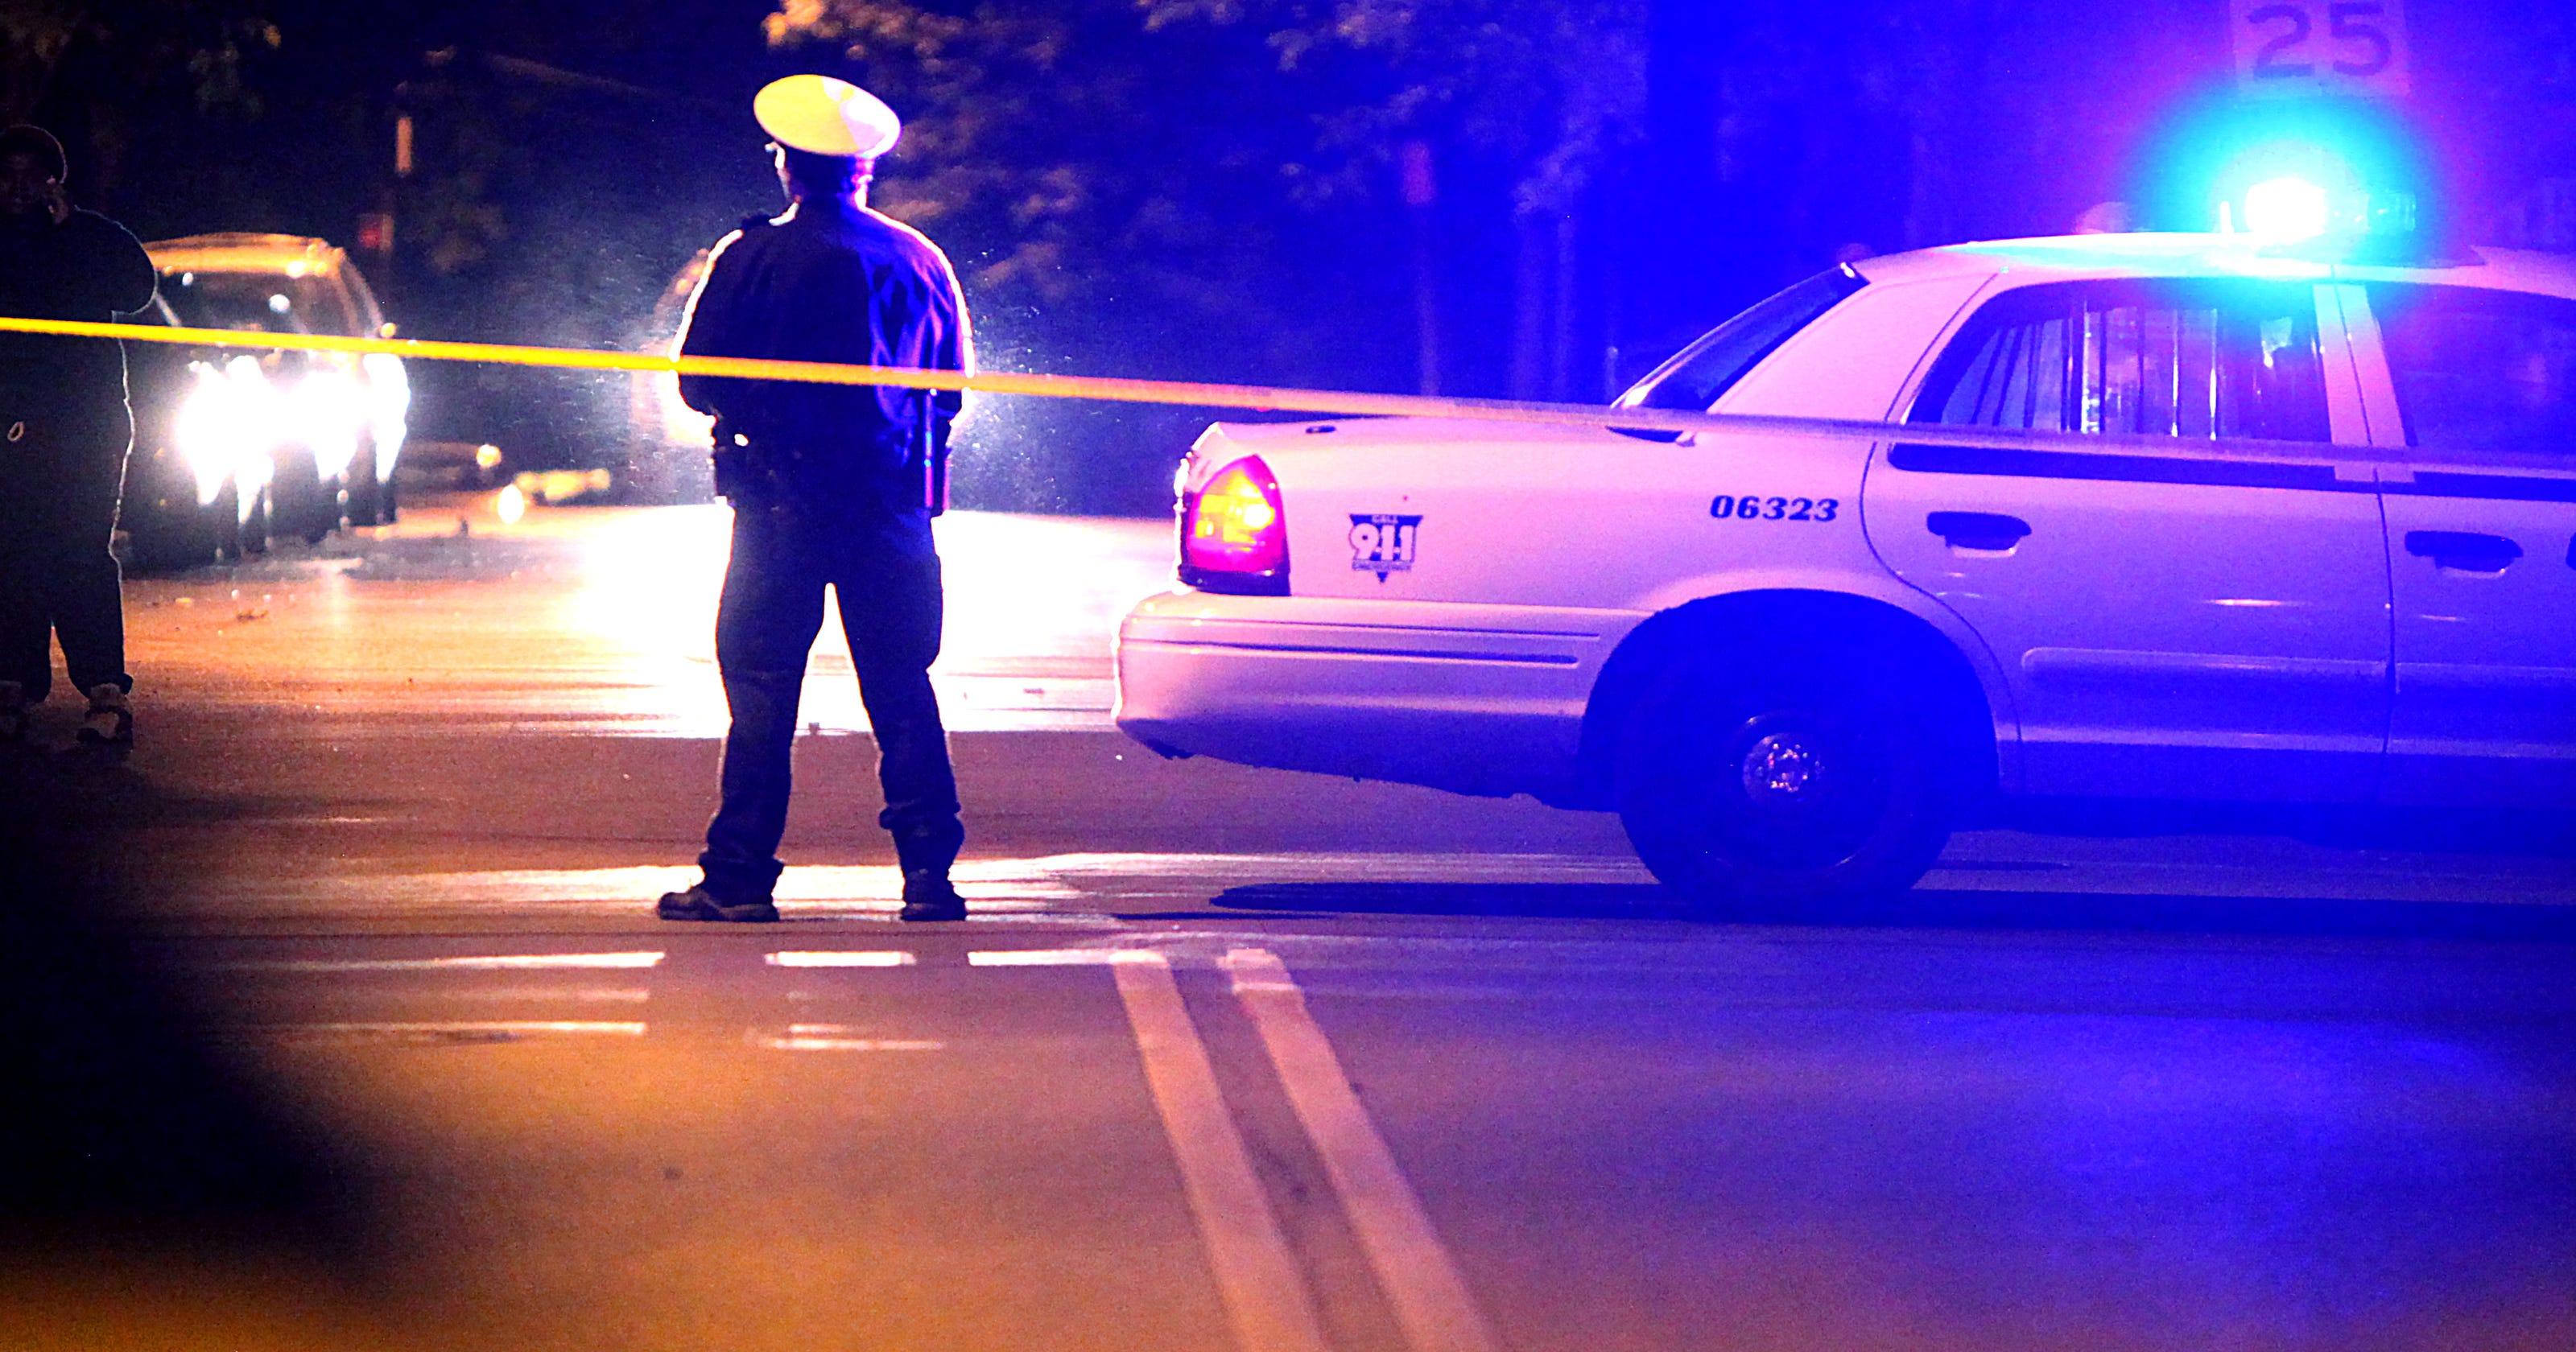 Ohio man faces felony in traffic death of unborn baby